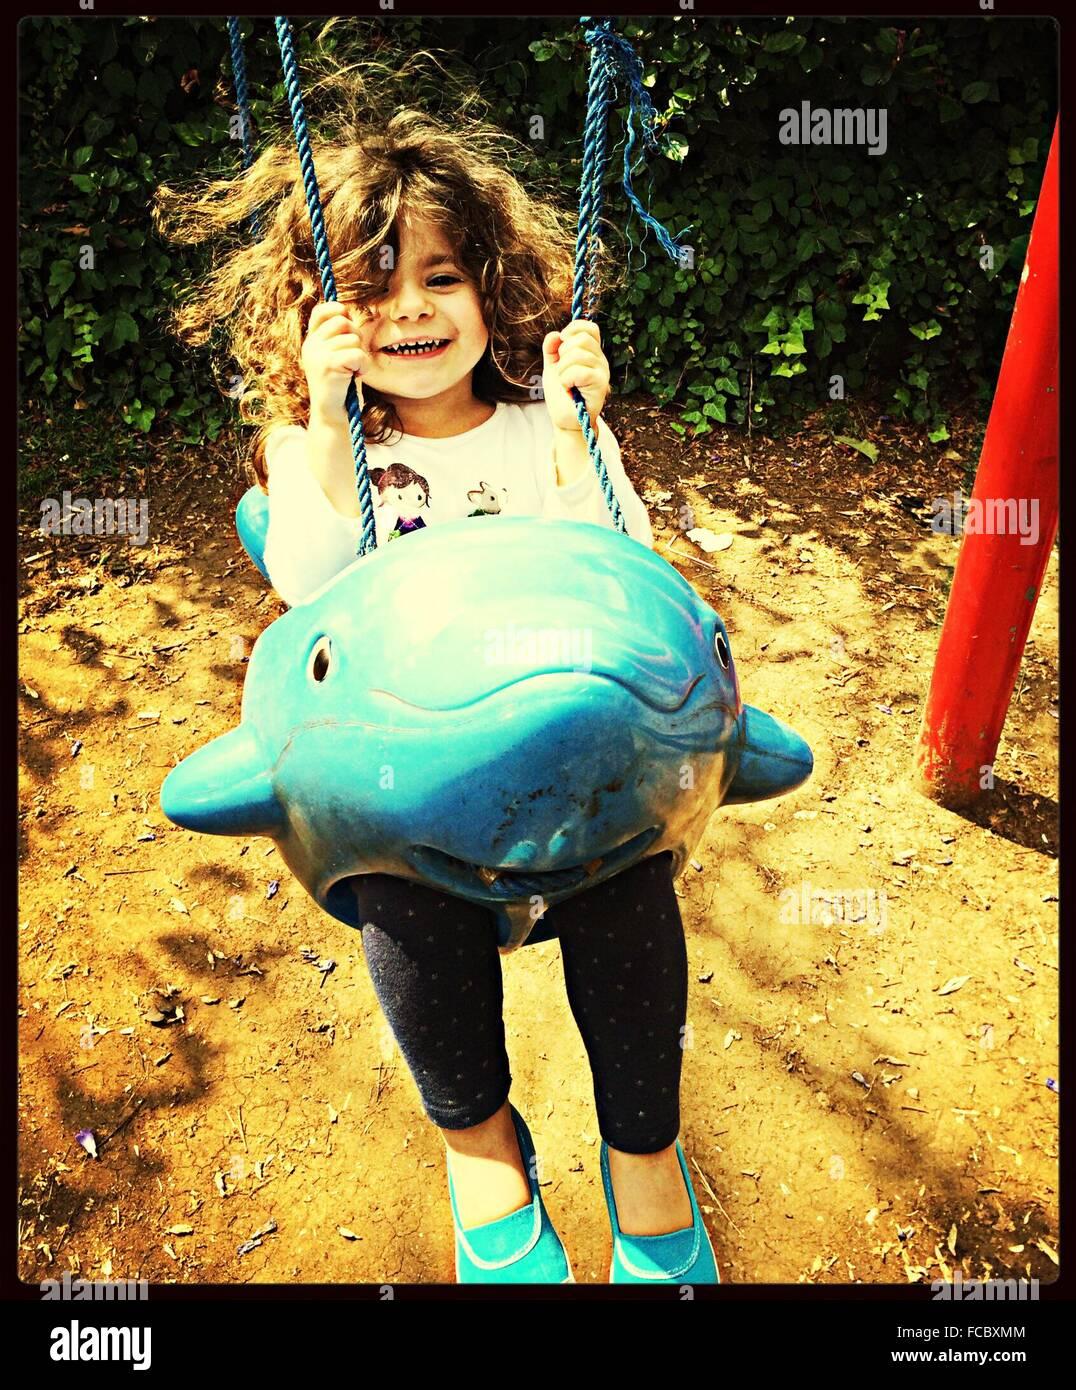 Girl Enjoying Swing Ride In Playground Photo Stock